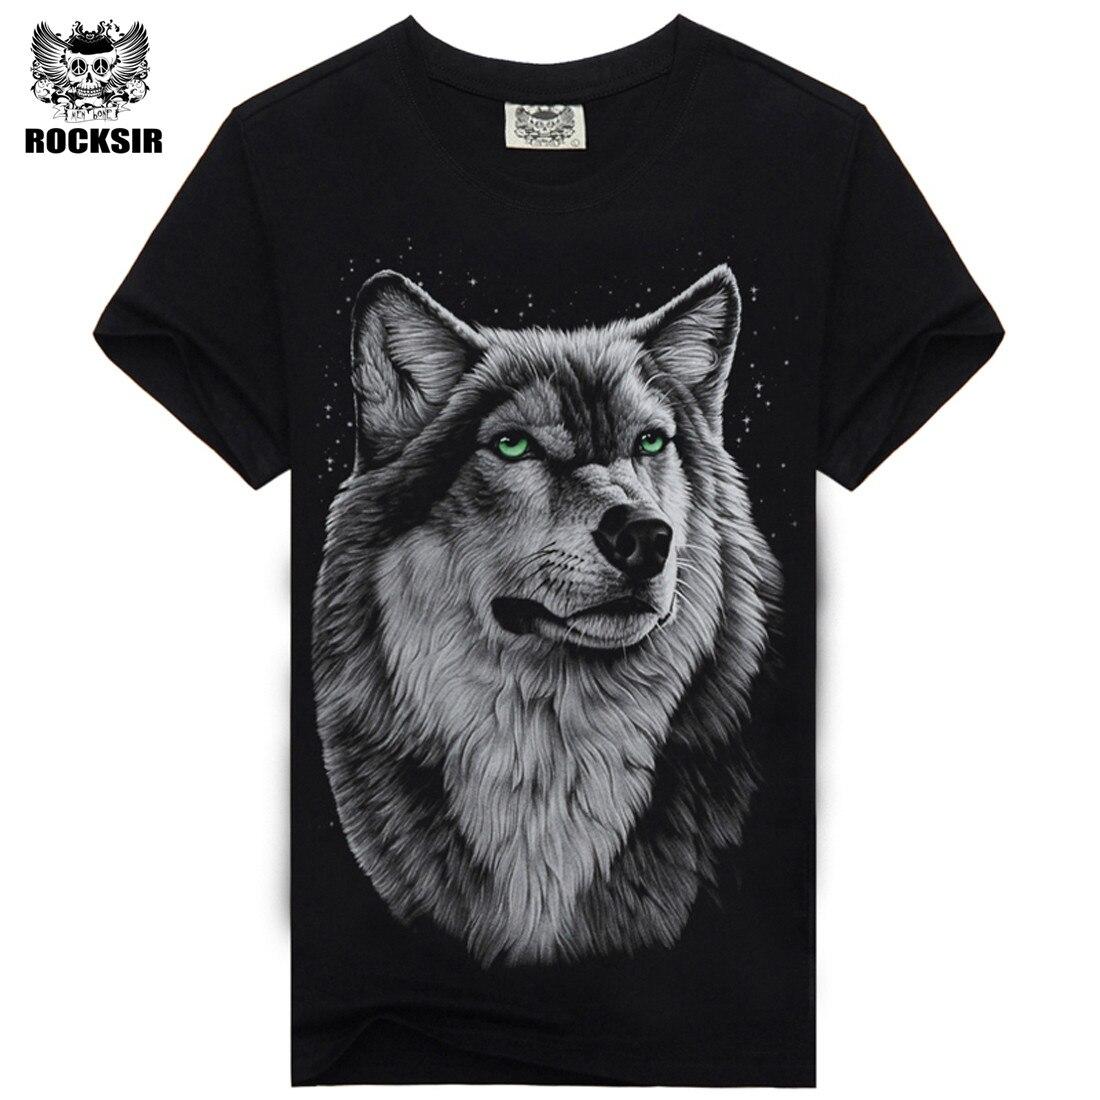 HTB1sCyTSpXXXXXZaXXXq6xXFXXXv - Rocksir 3d wolf t shirt Indians wolf t shirts boyfriend gift ideas